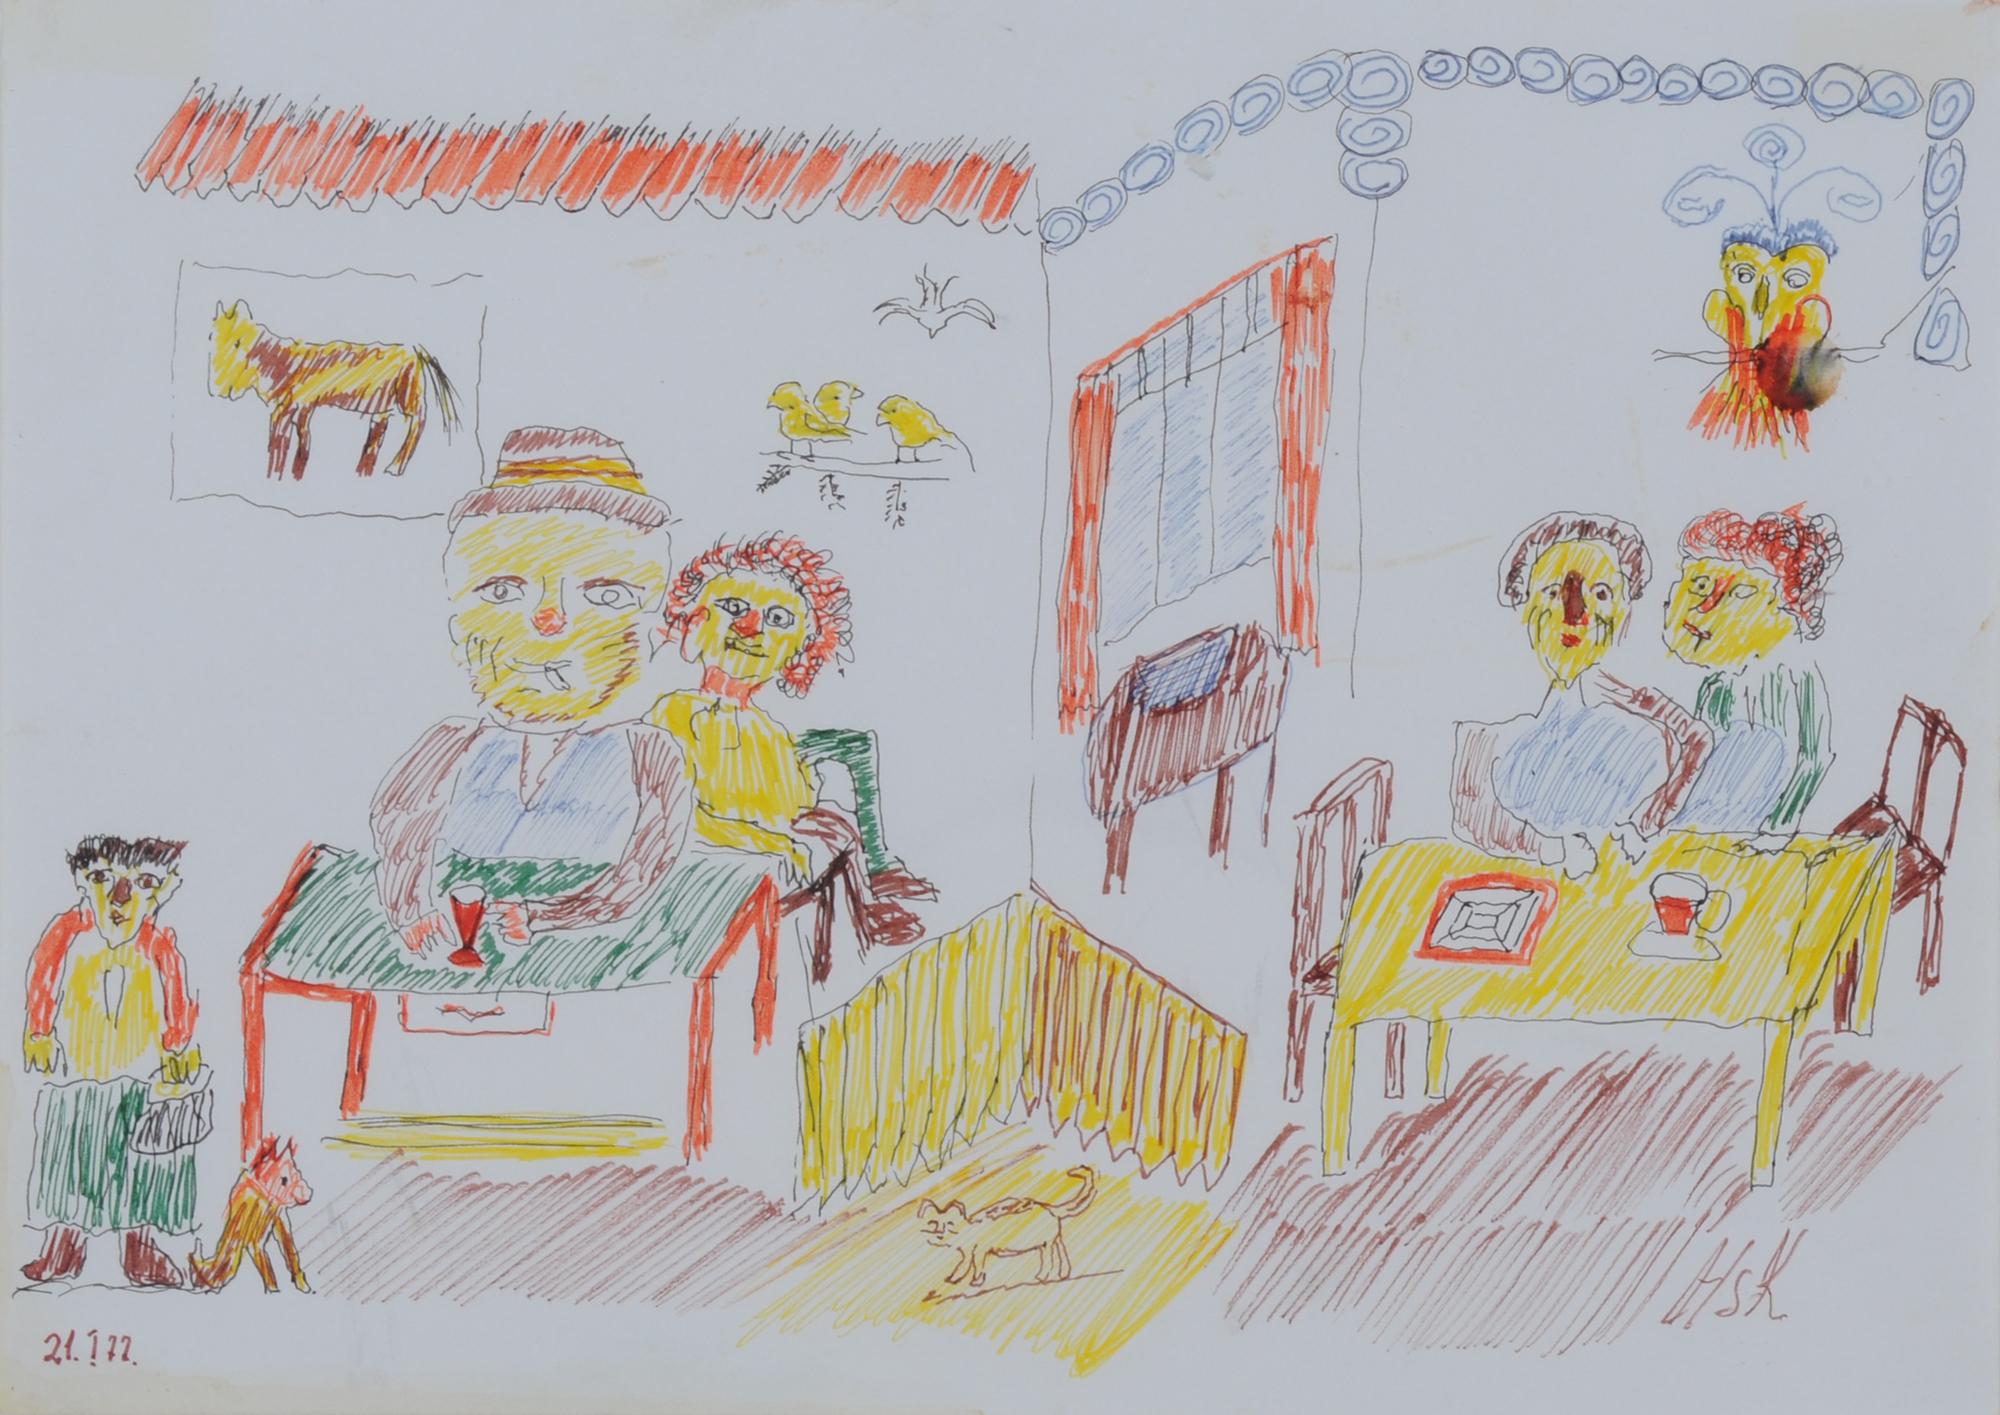 Krüsi Hans, Familientisch (Family Table)